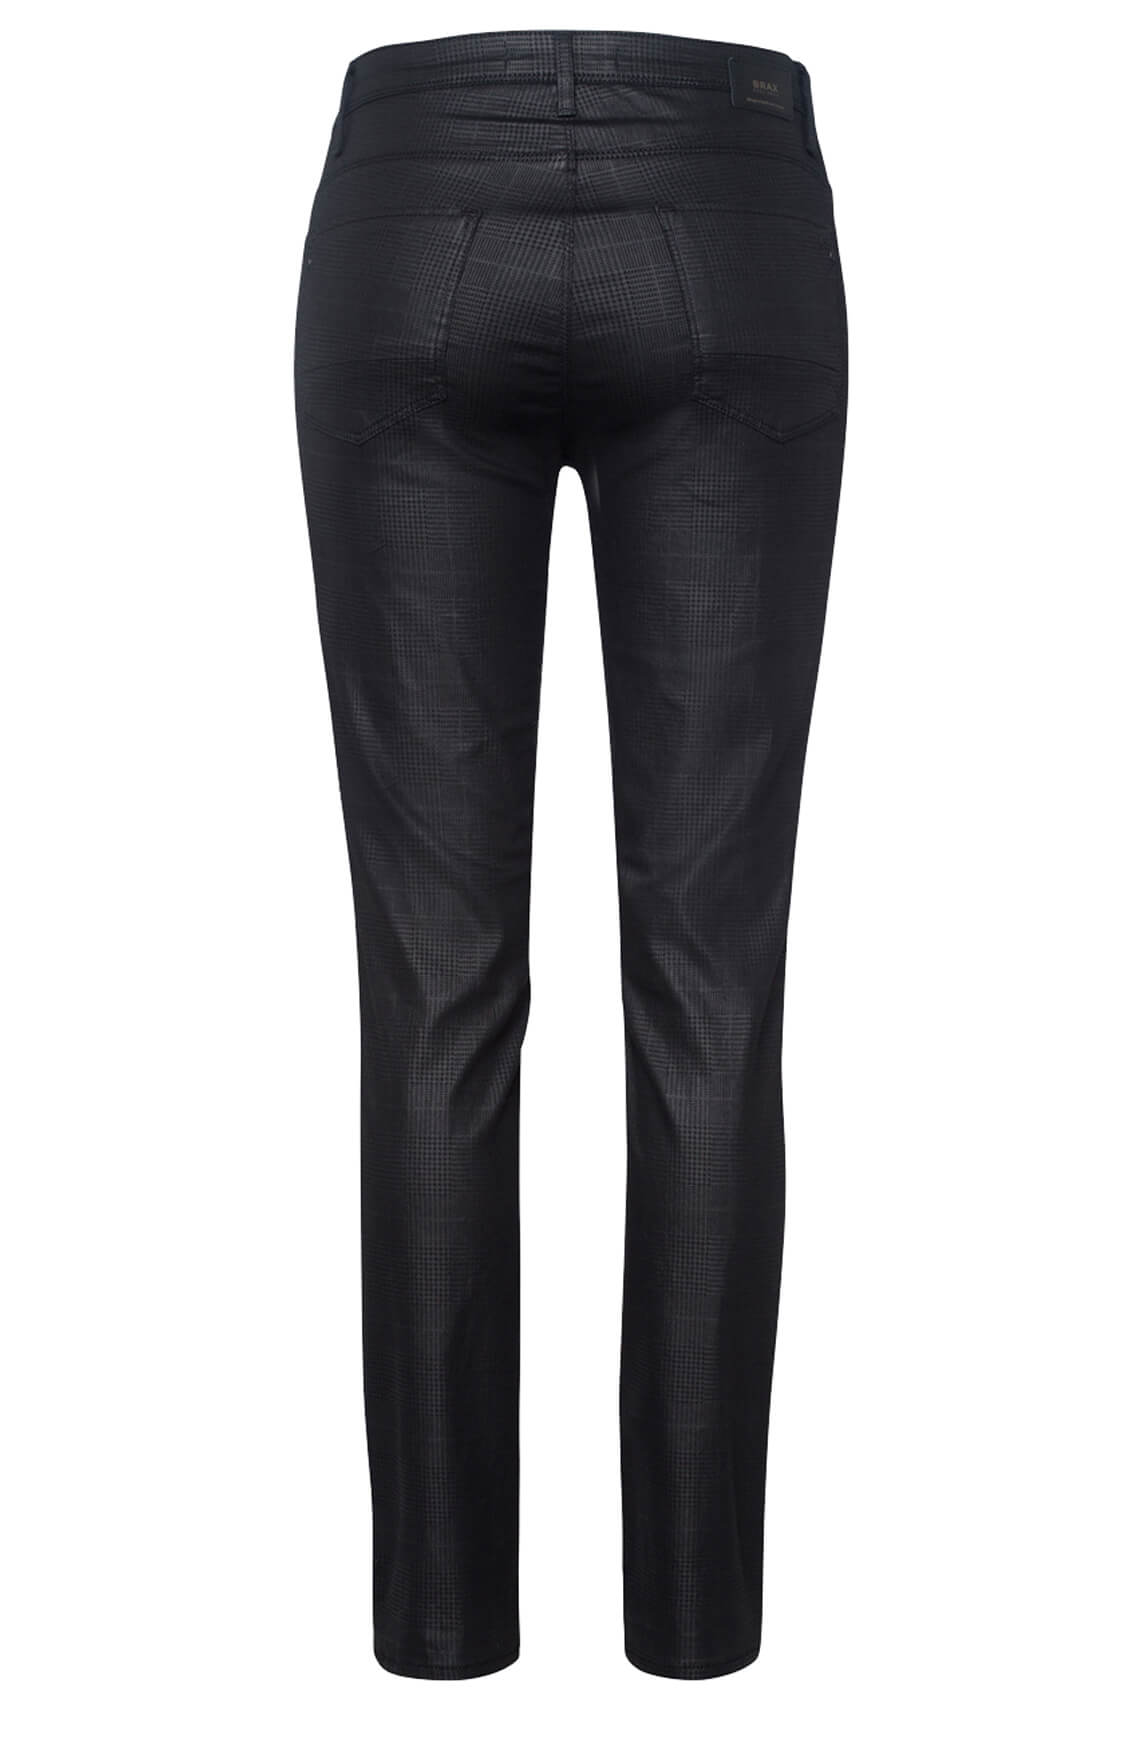 Brax Dames Shakira gecoate broek zwart